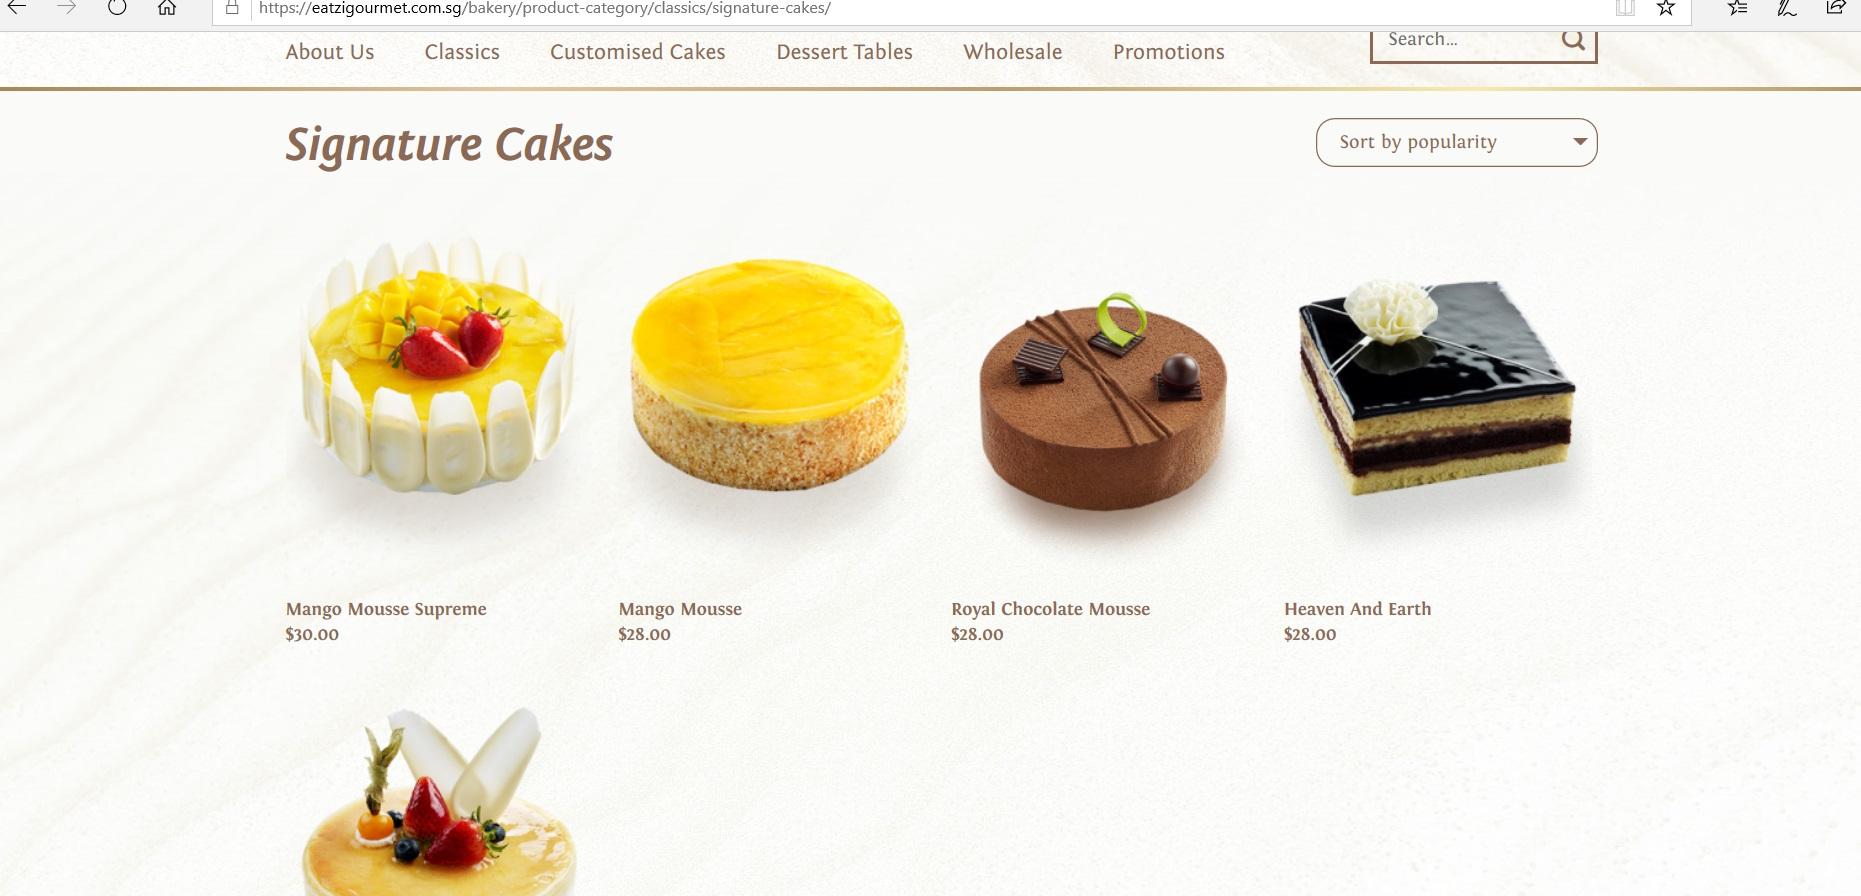 Catalogue of signature cakes.